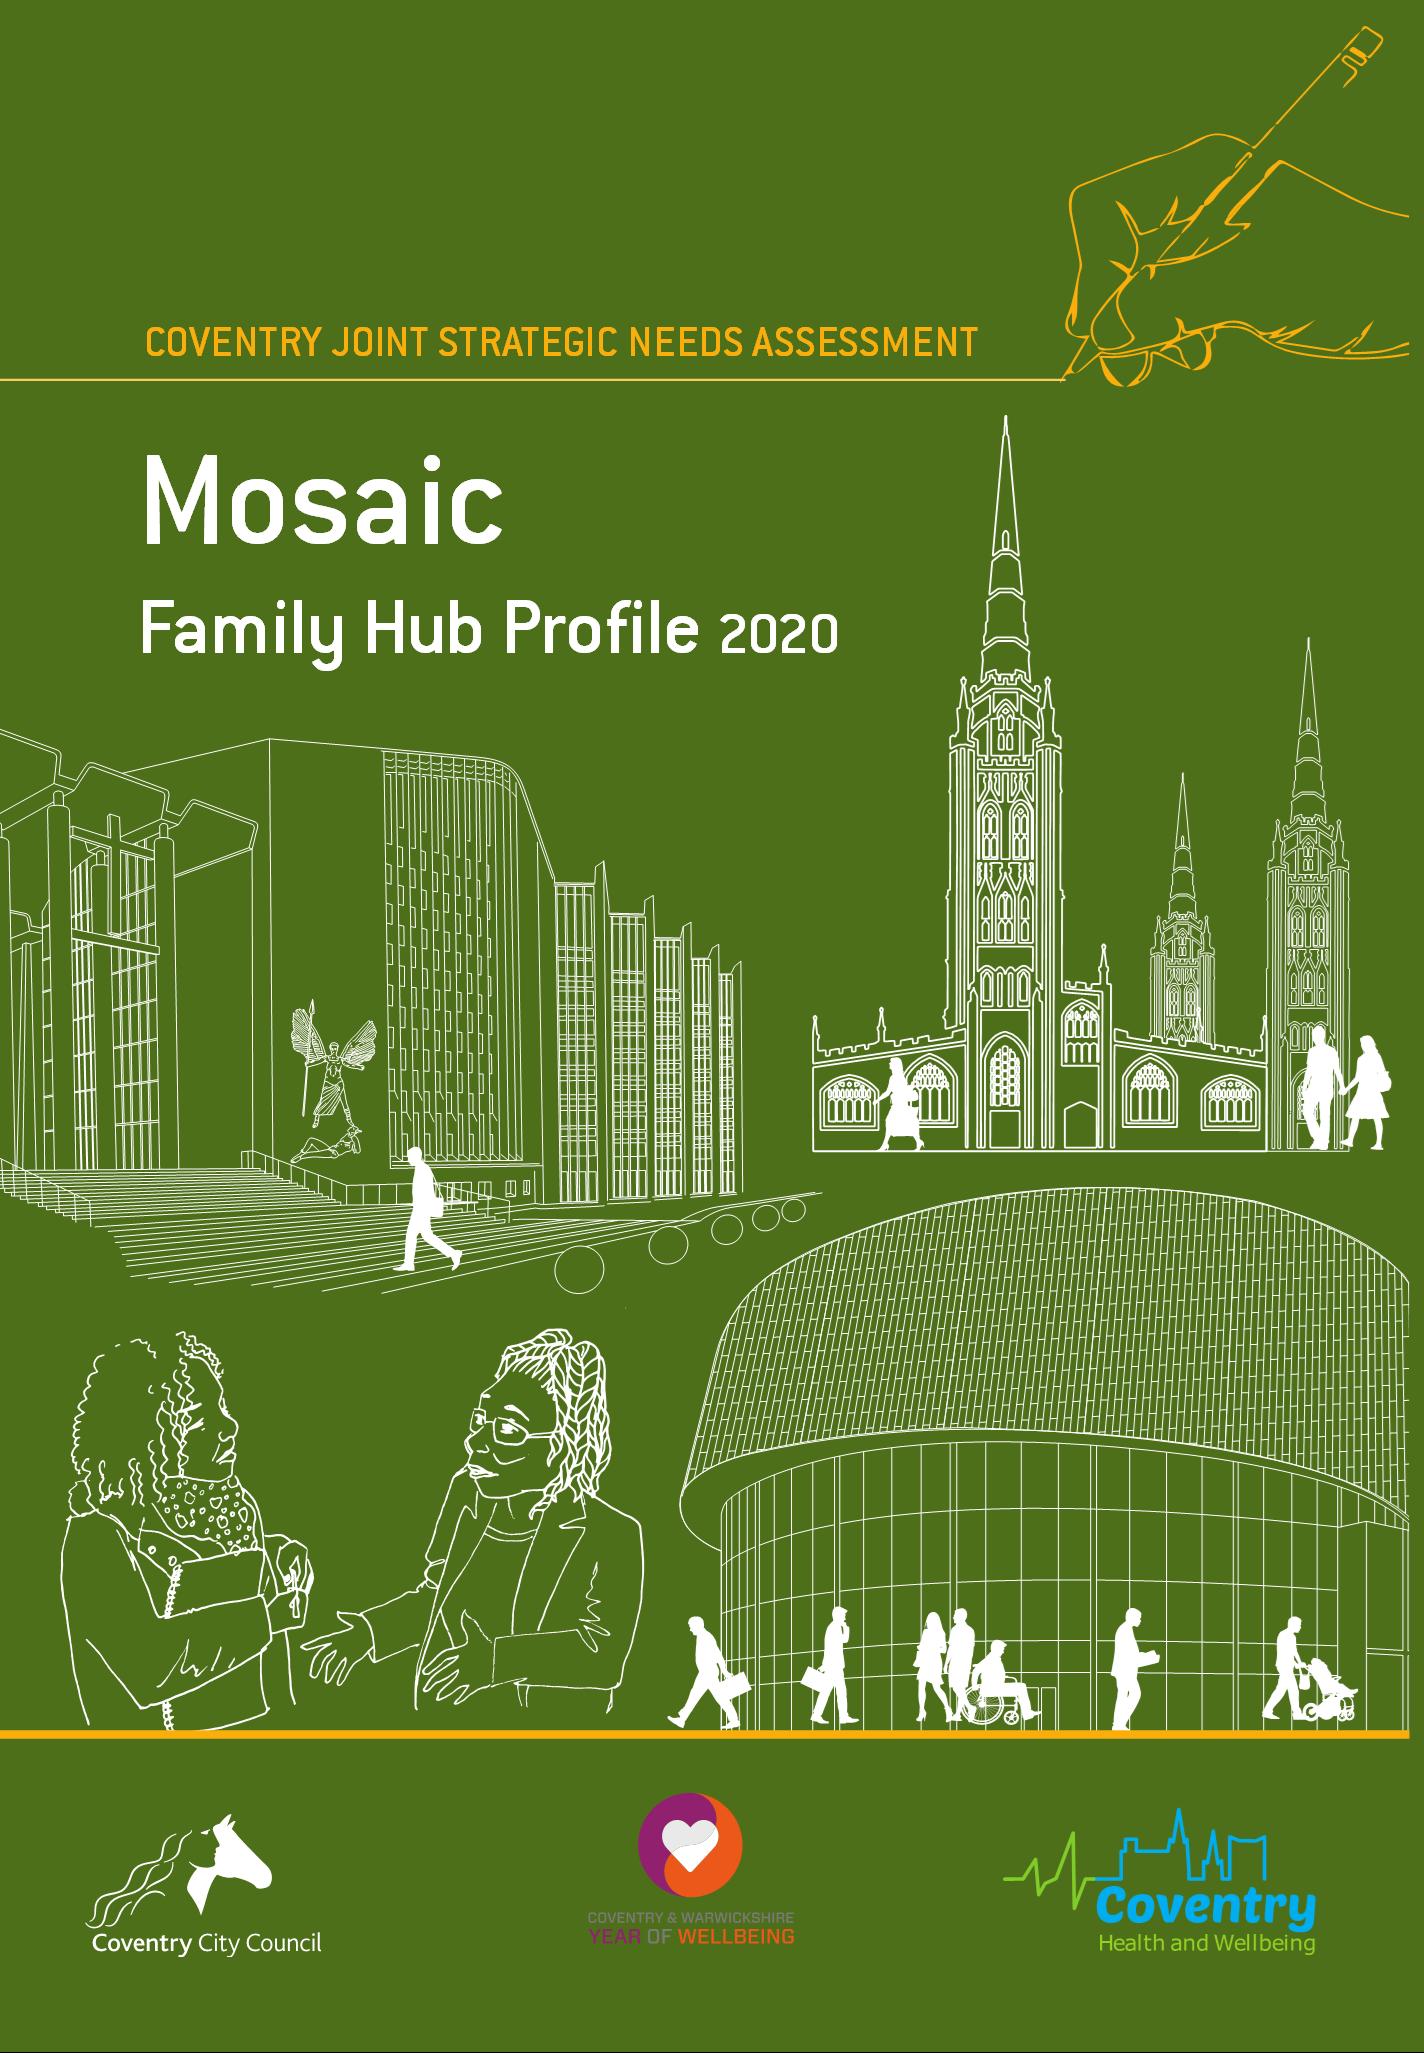 Mosaic profile 2020